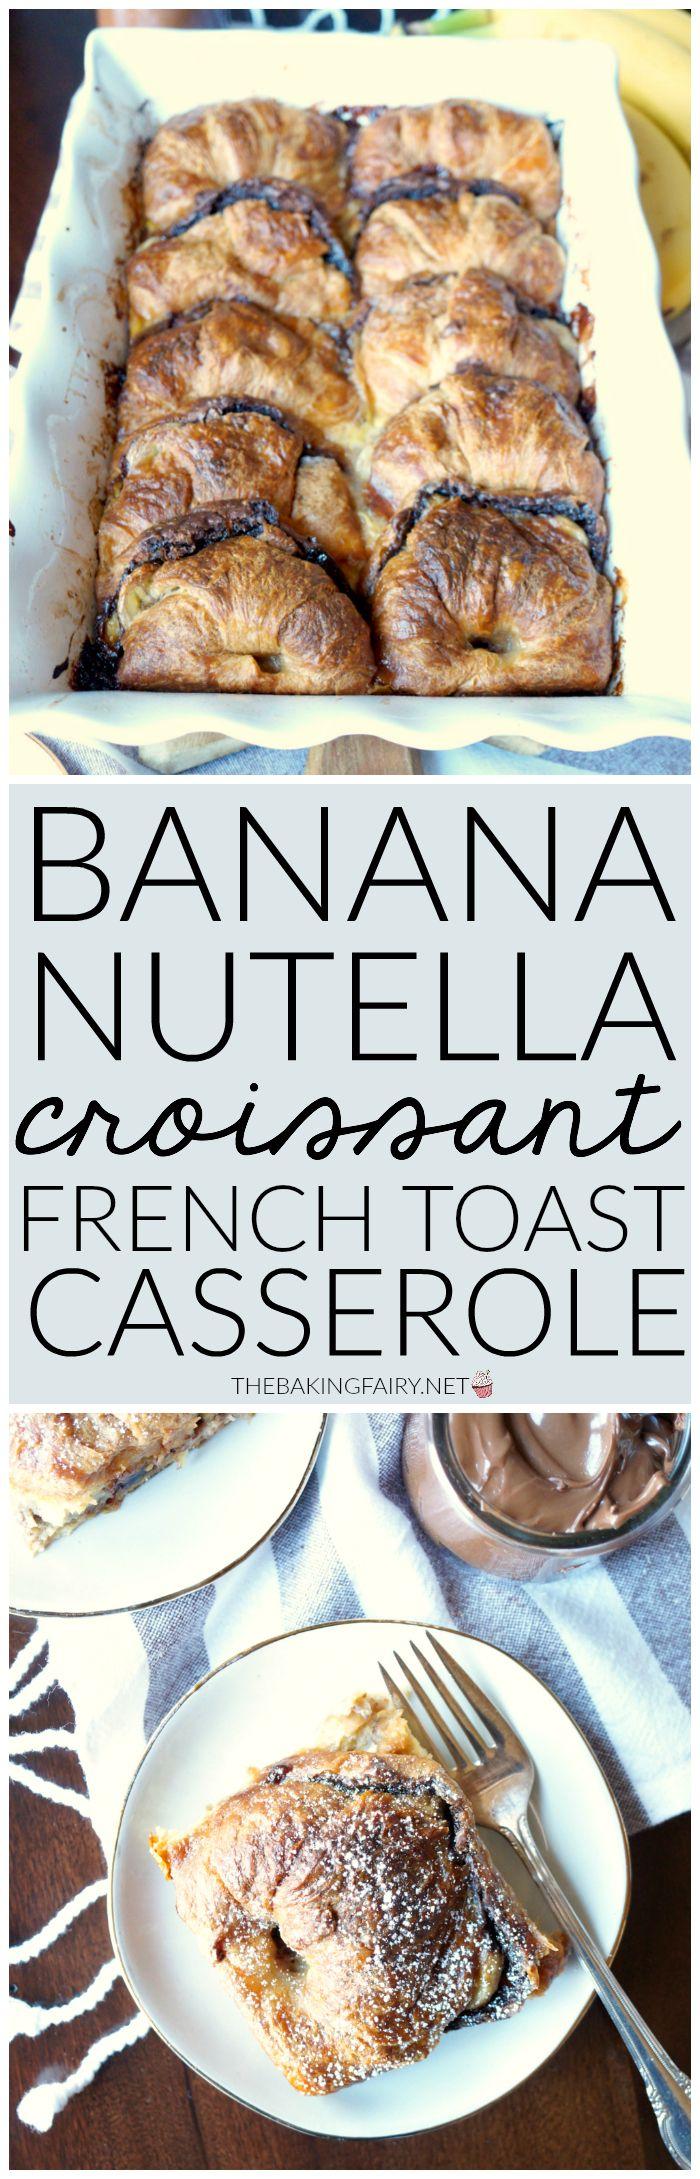 banana Nutella croissant french toast casserole | The Baking Fairy